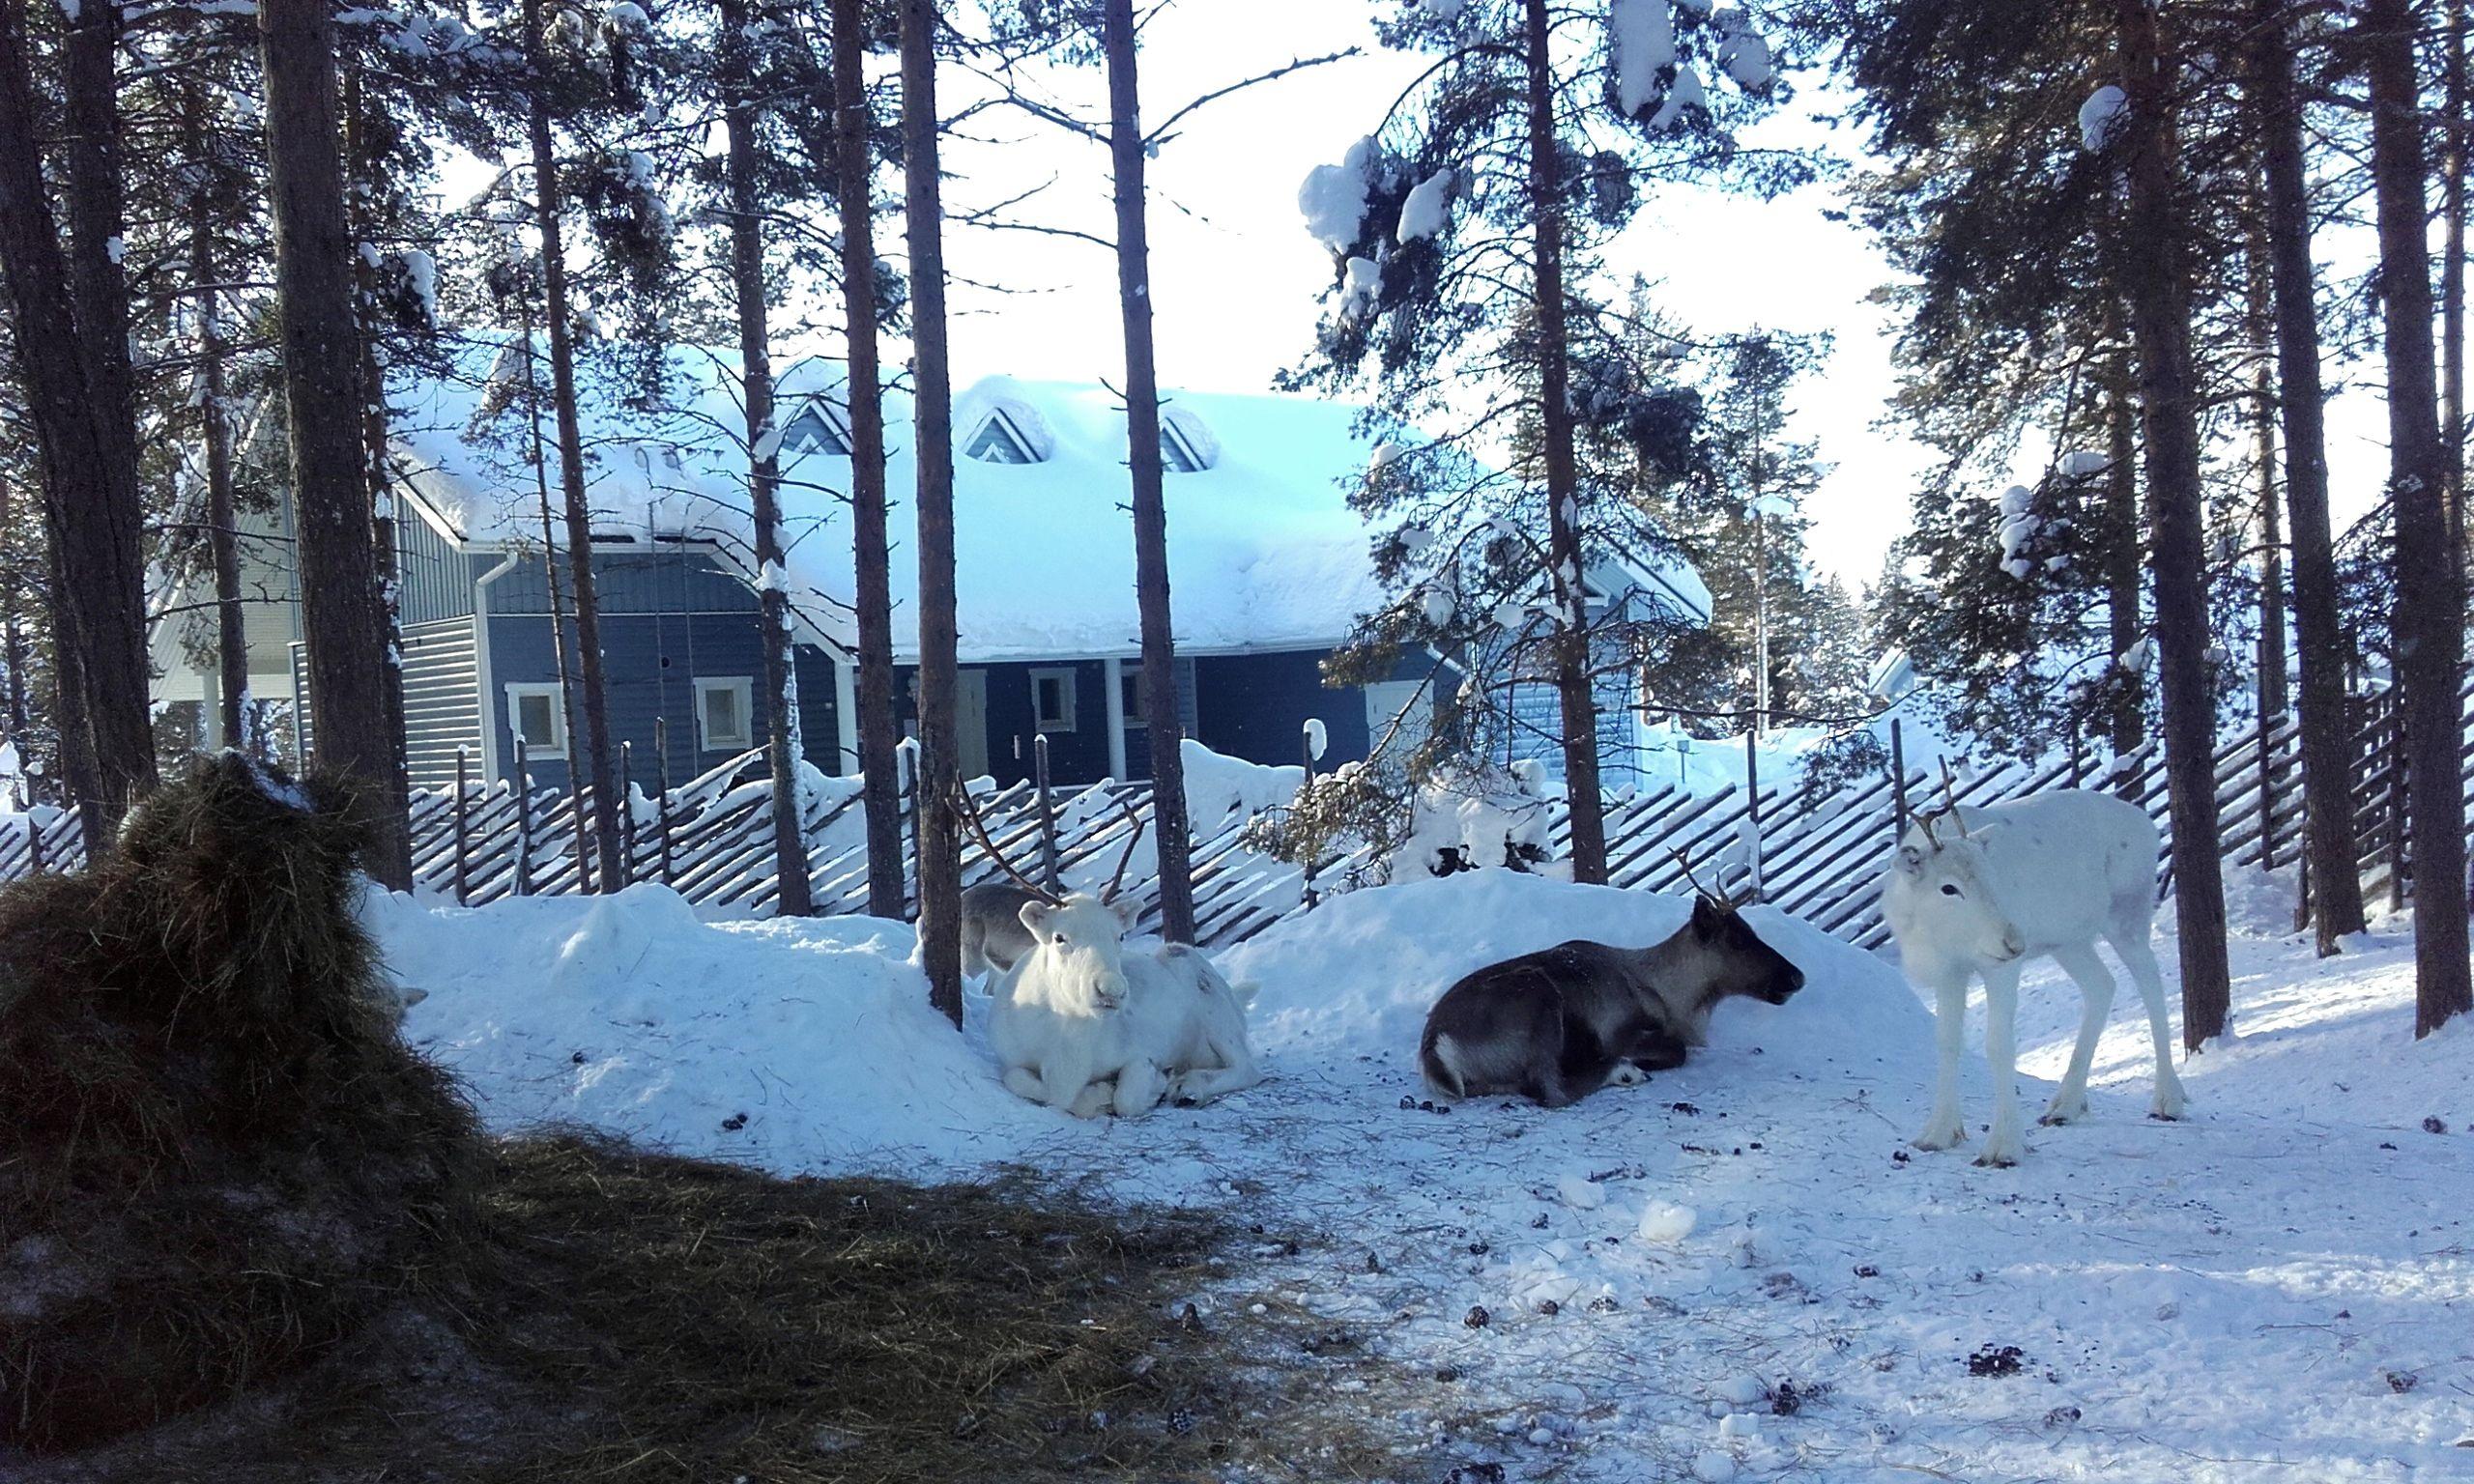 Granja de renos en Levi